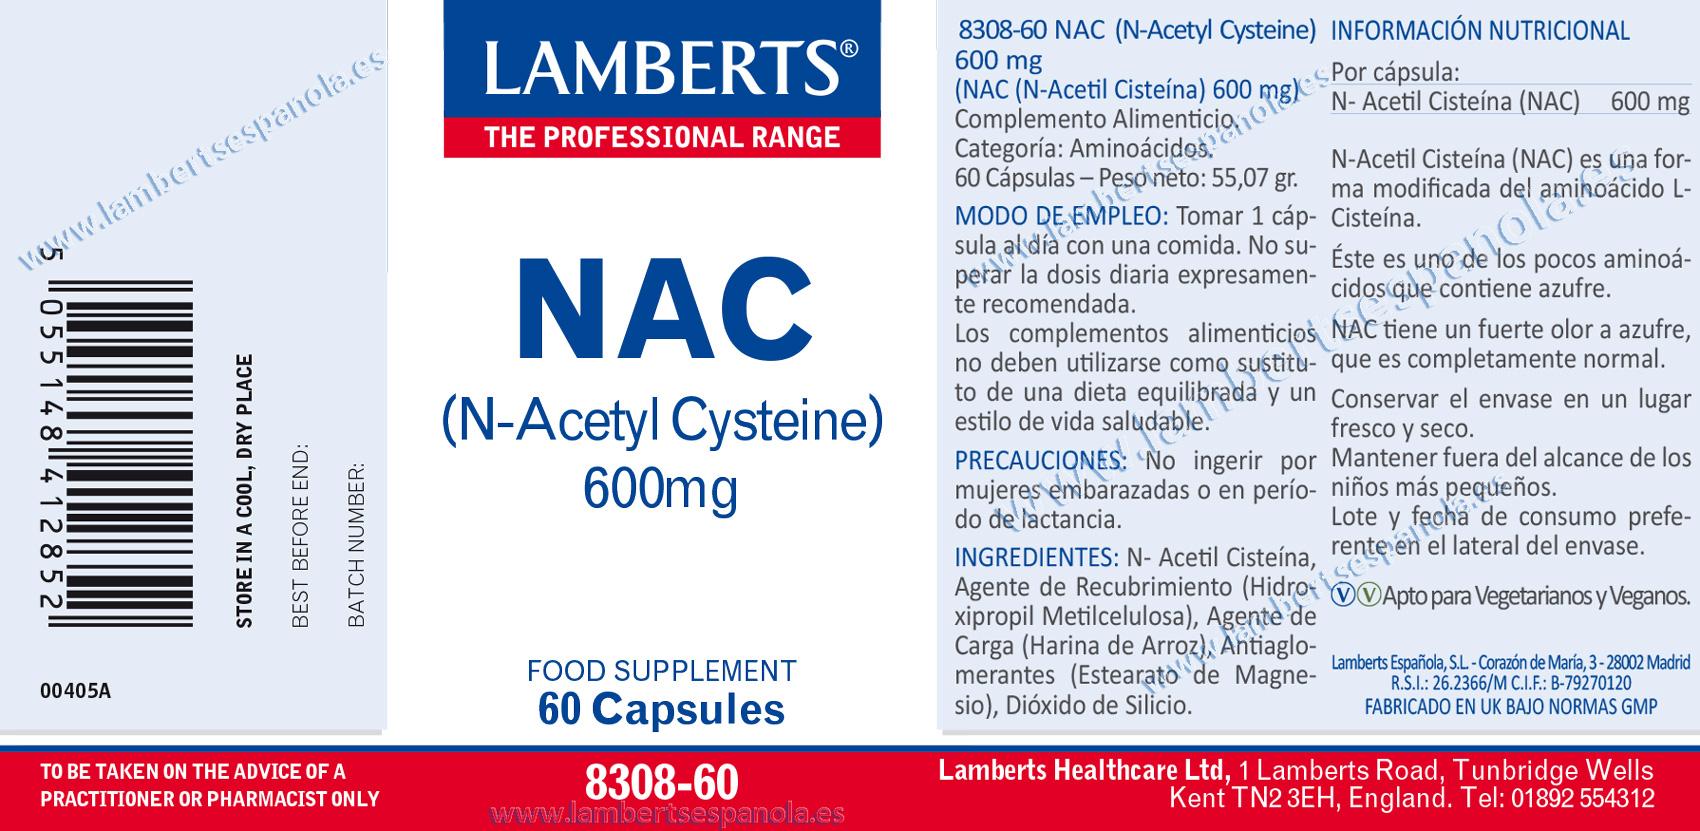 NAC (N-Acetilcisteína)